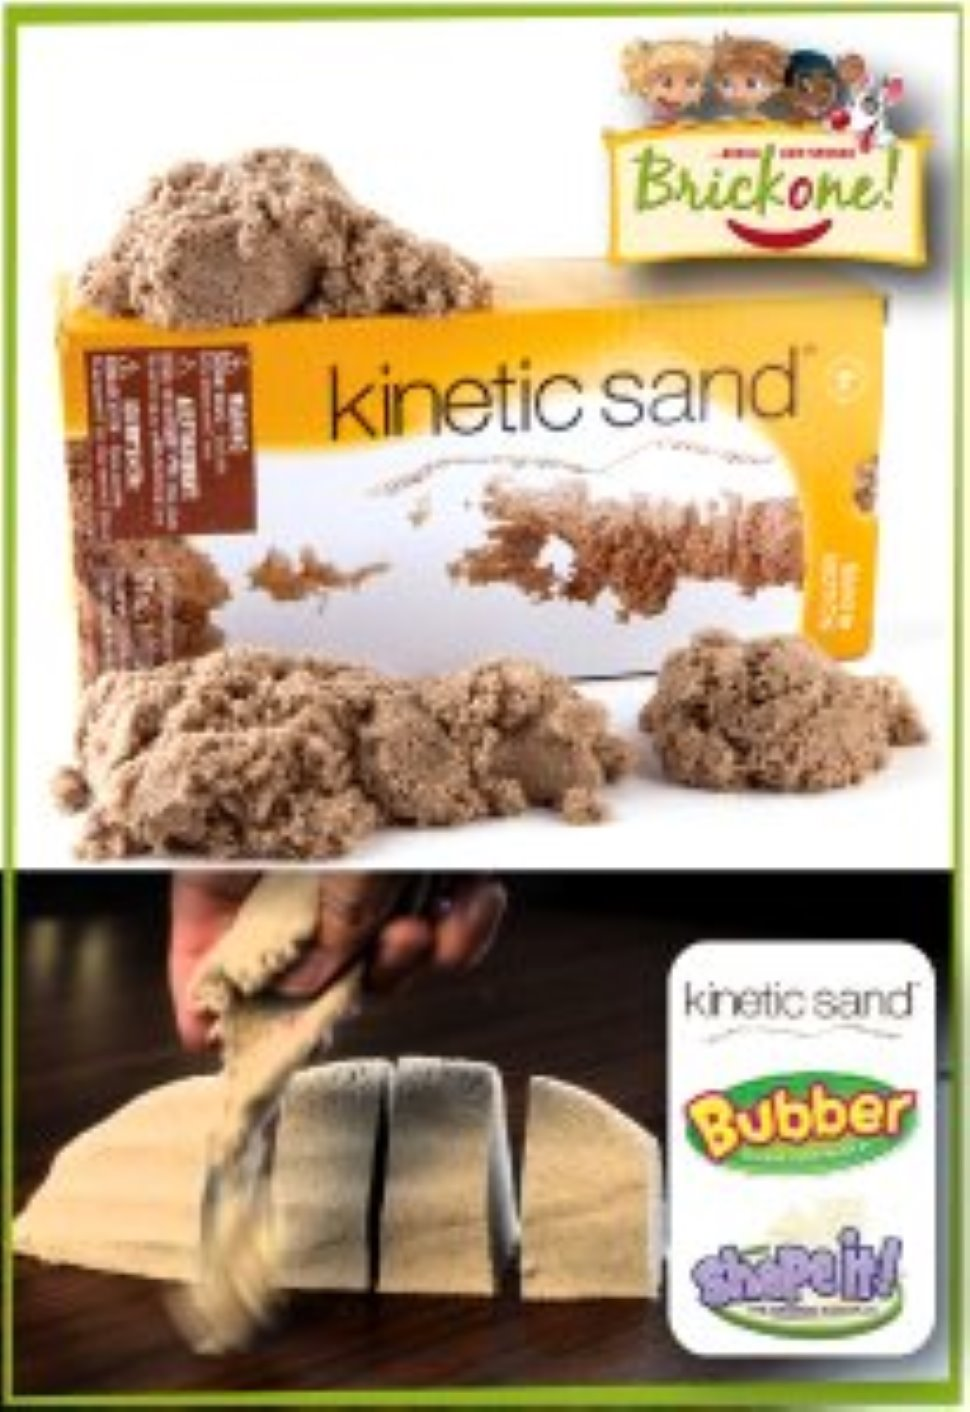 Sabbia Cinetica a Udine - Kinetic Sand